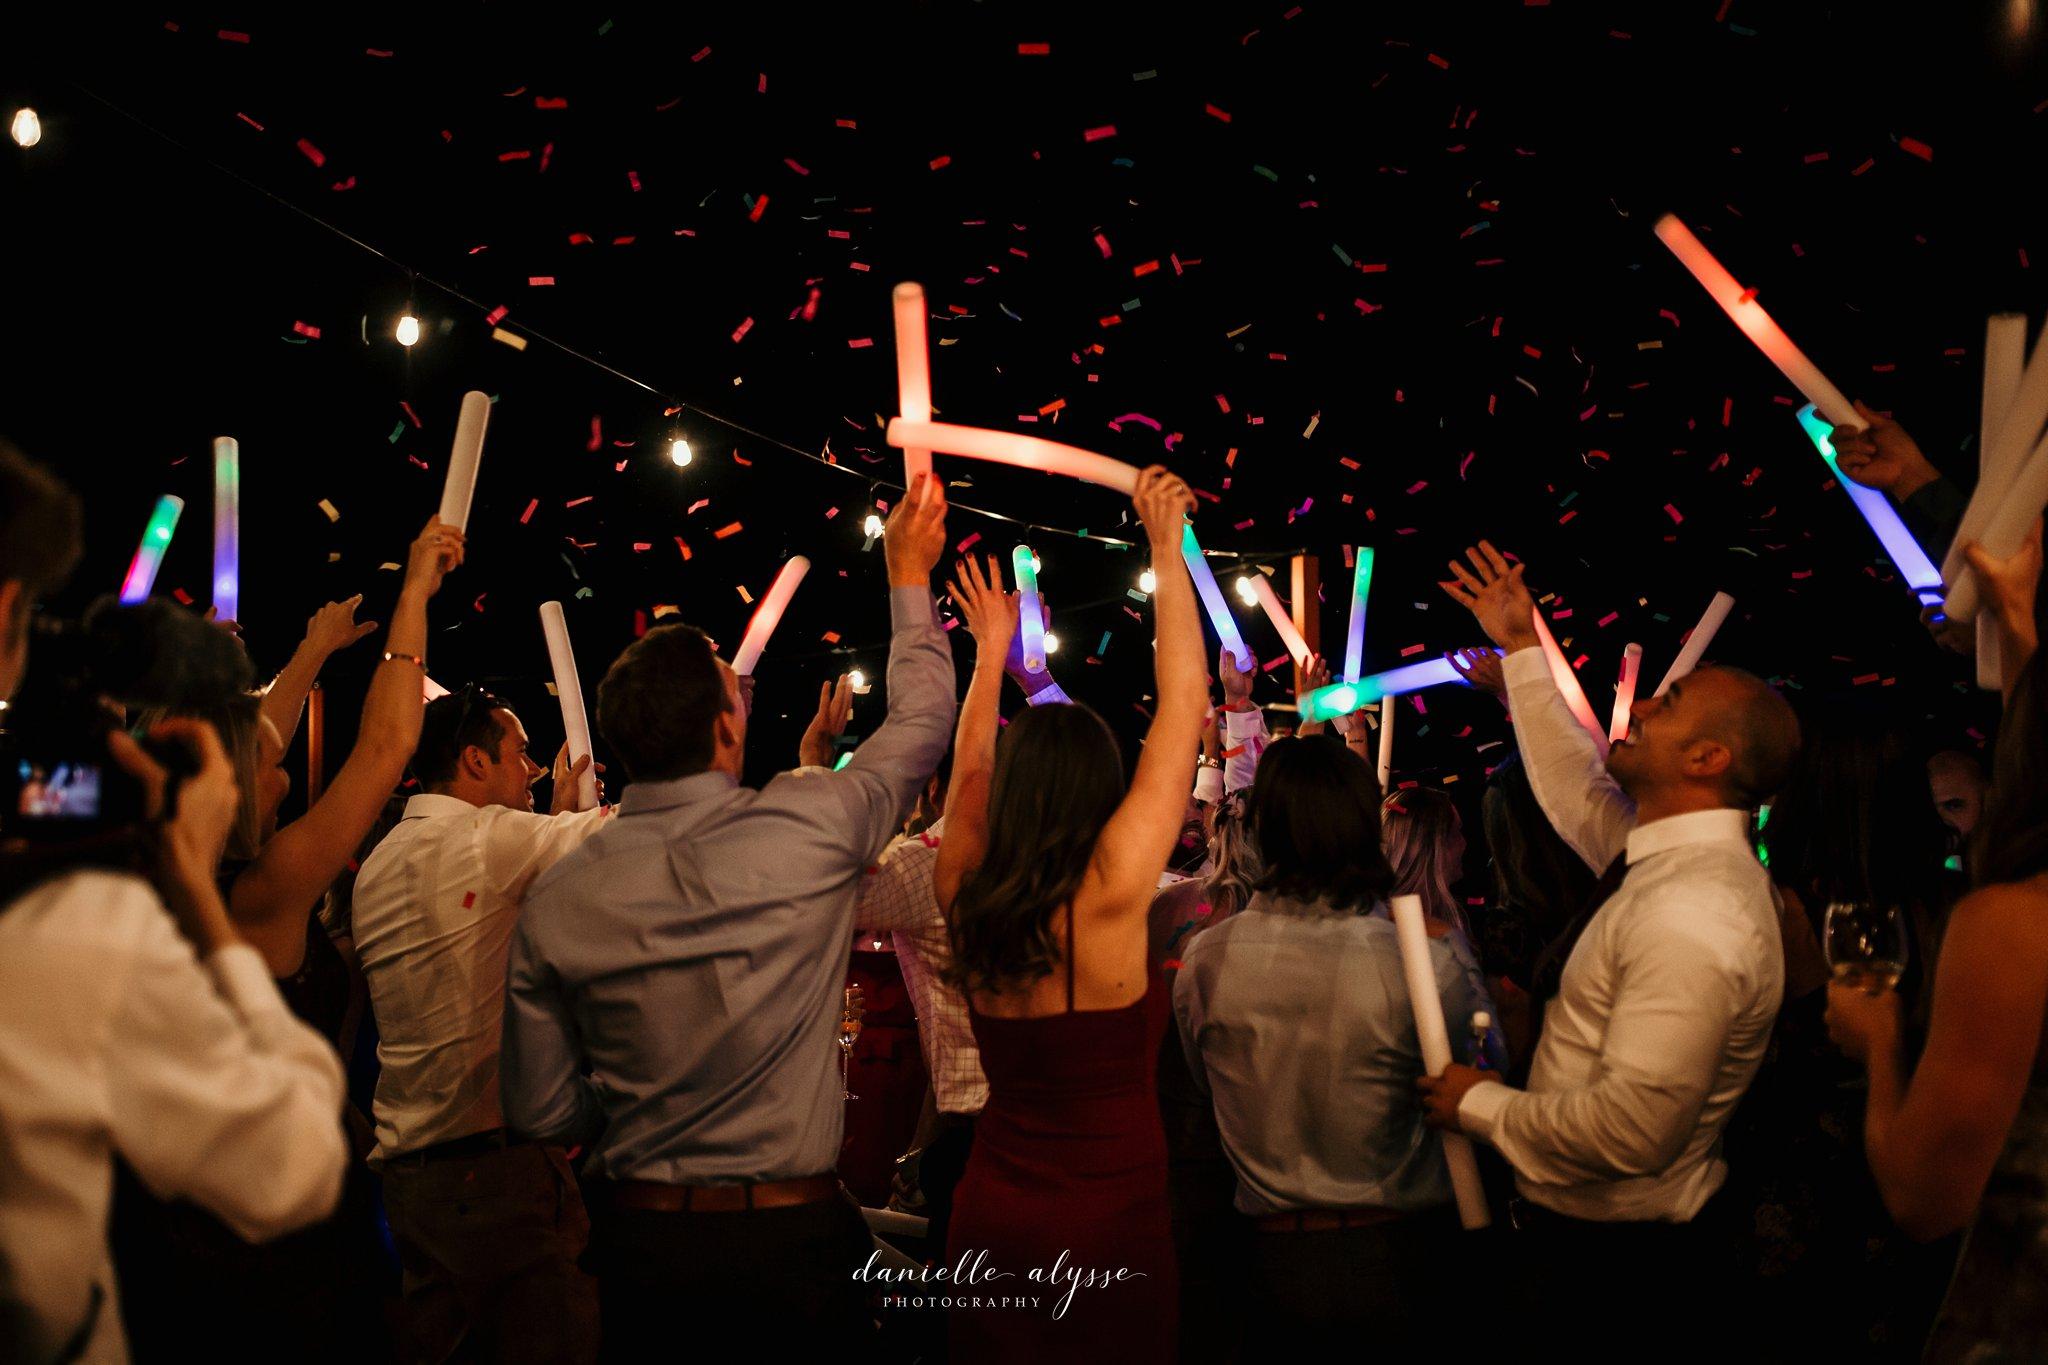 180831_wedding_stephanie_heavenly_south_lake_tahoe_danielle_alysse_photography_destination_blog_1260_WEB.jpg